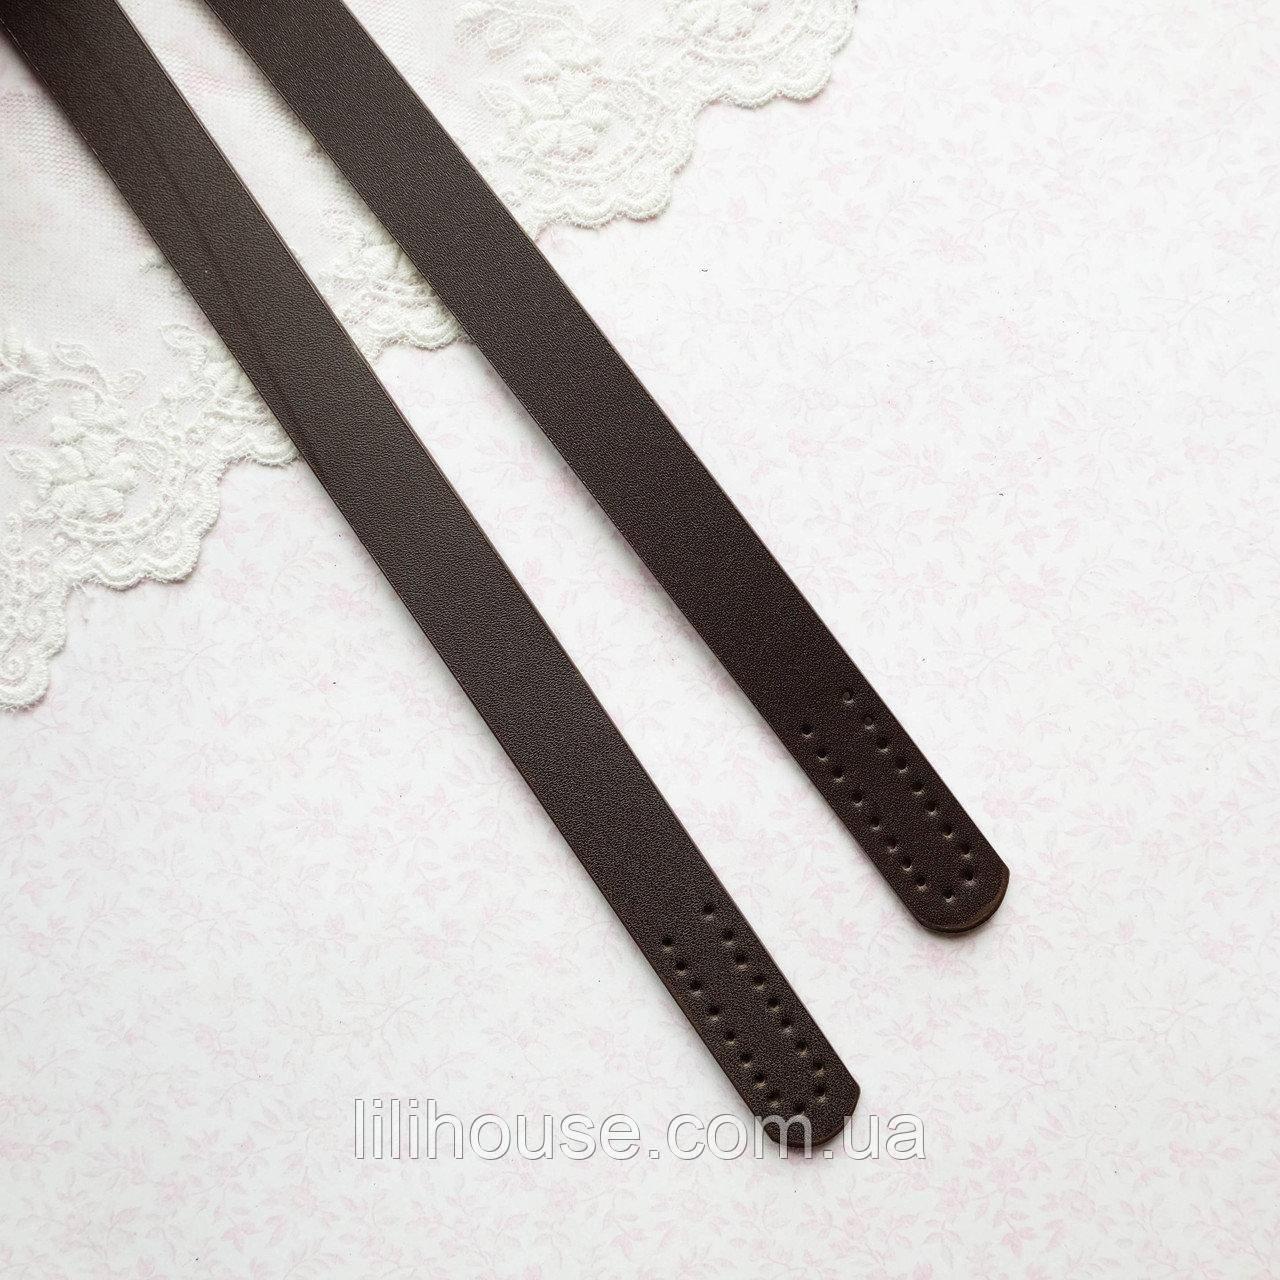 Ручки КОЖА для Сумки МОНМАРТР 63 см Темно-Коричневые